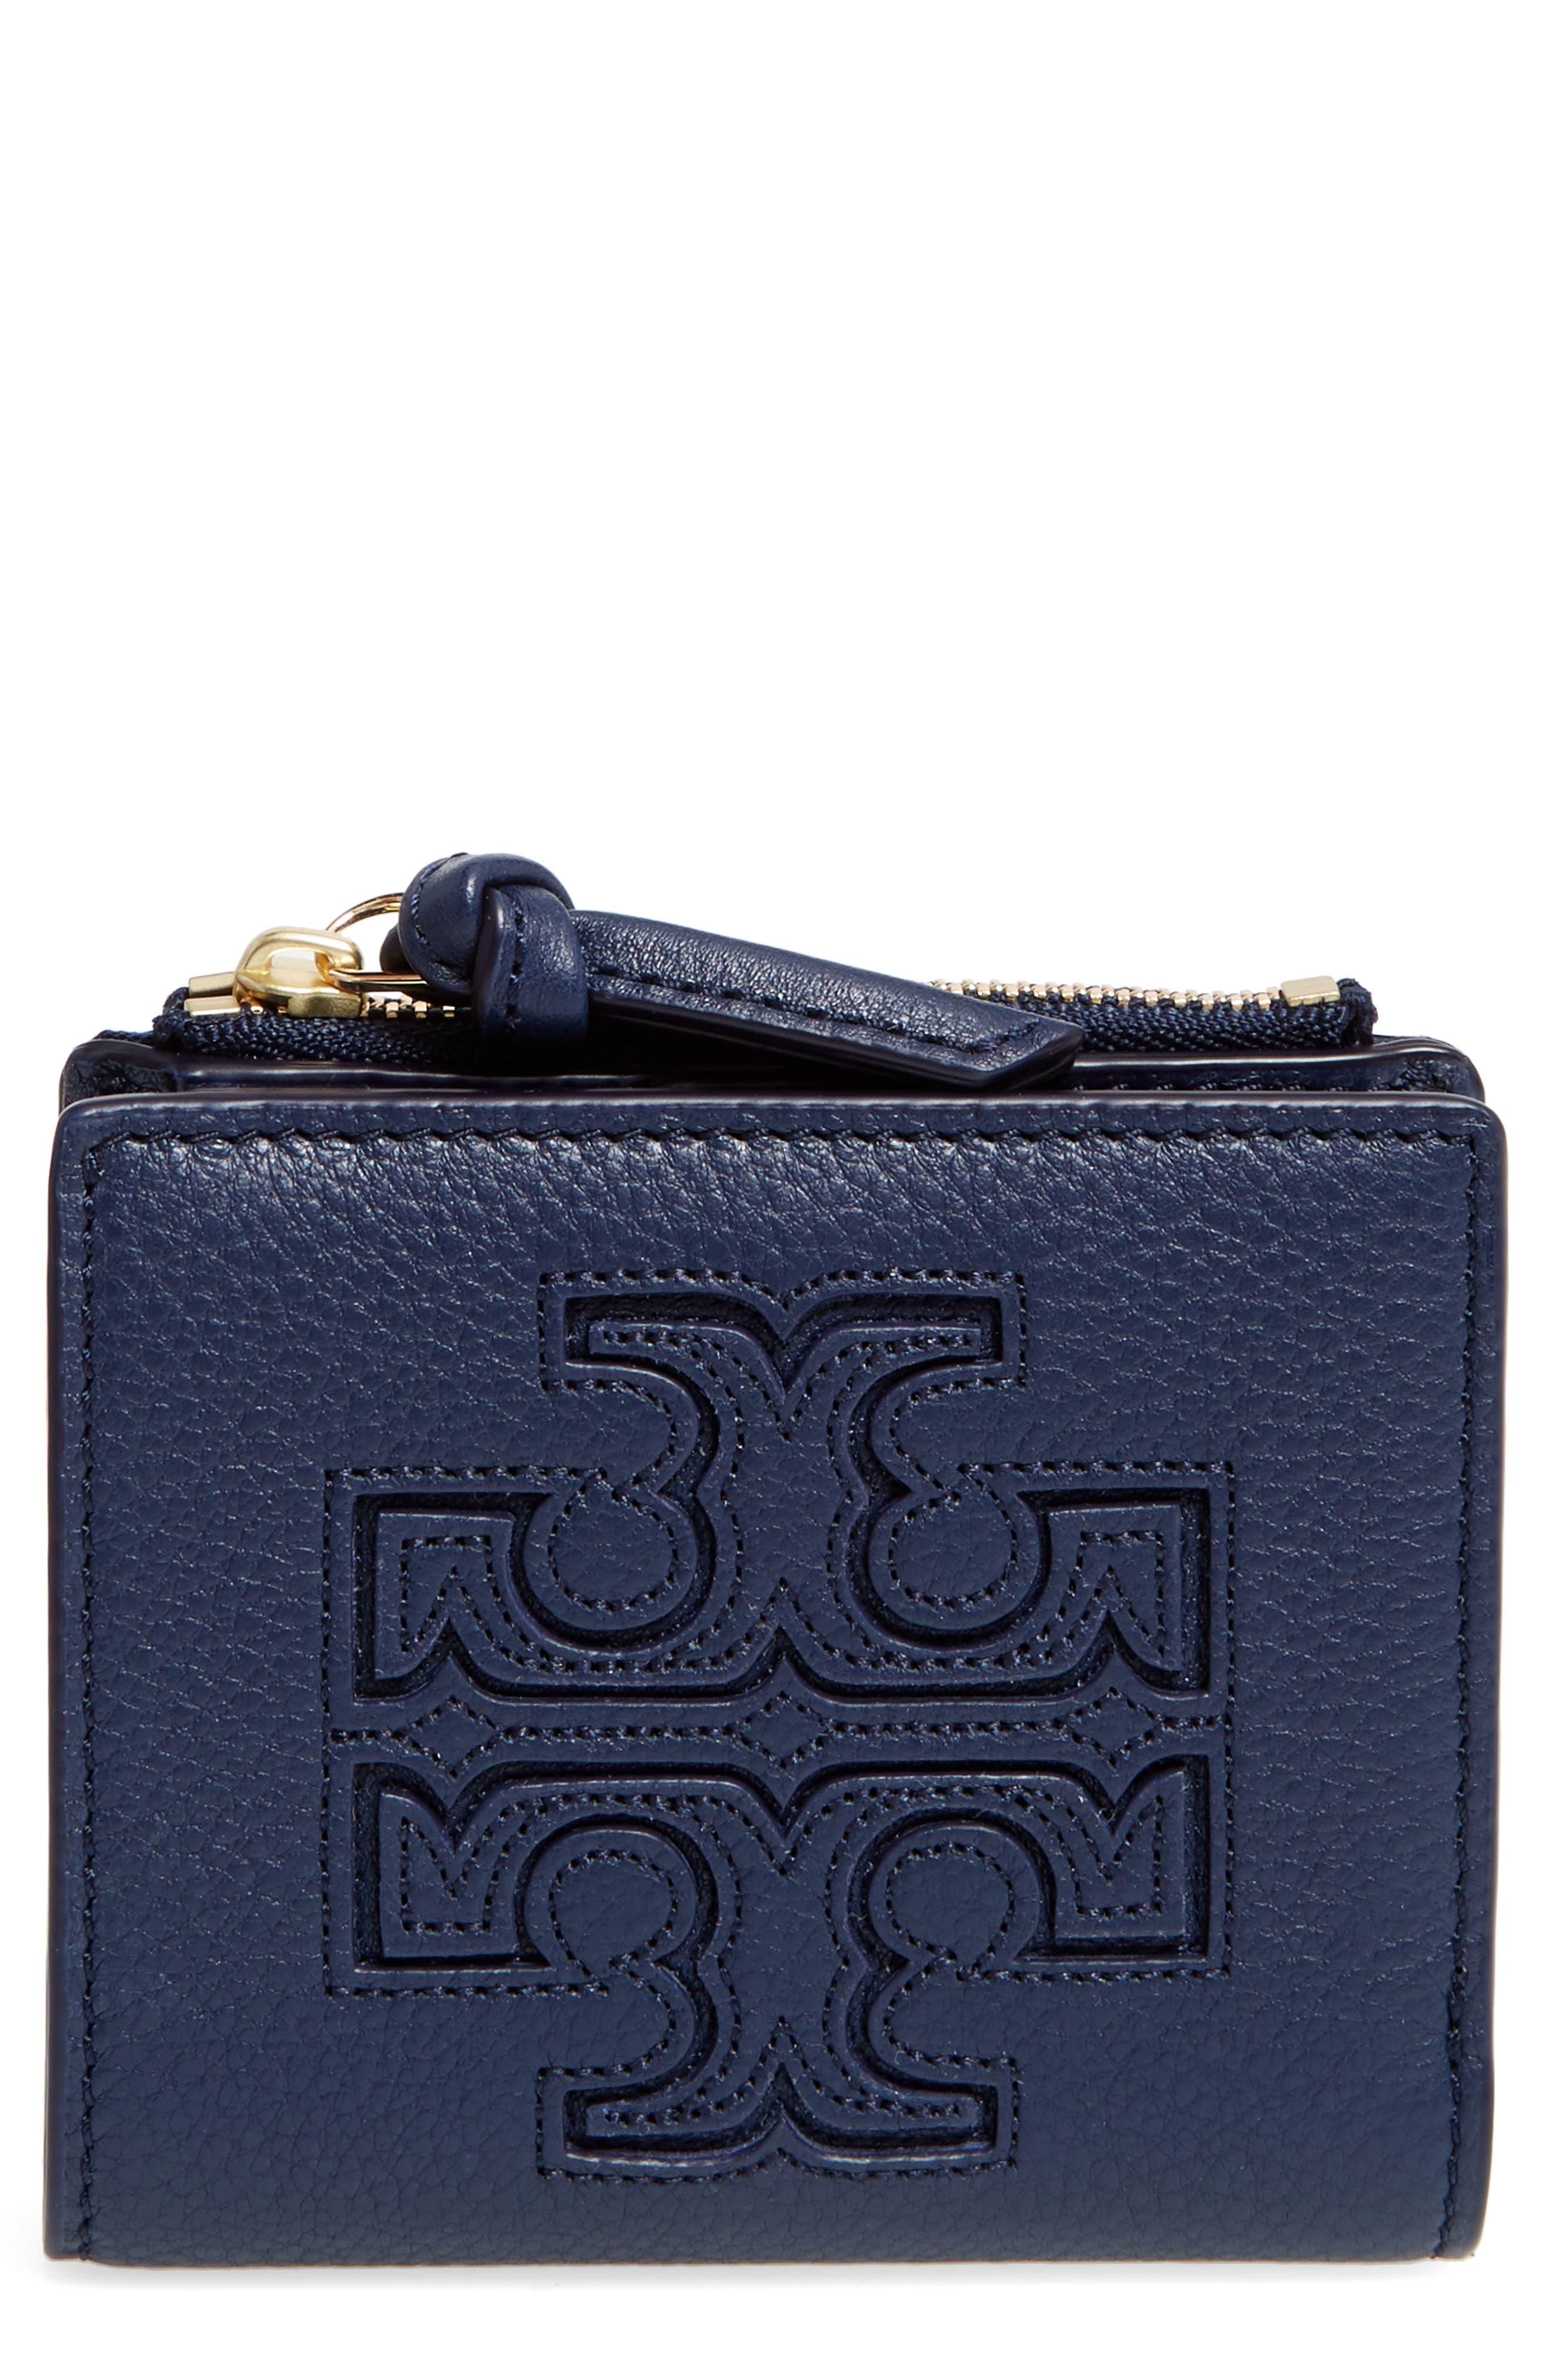 Main Image - Tory Burch 'Mini Harper' Leather Wallet